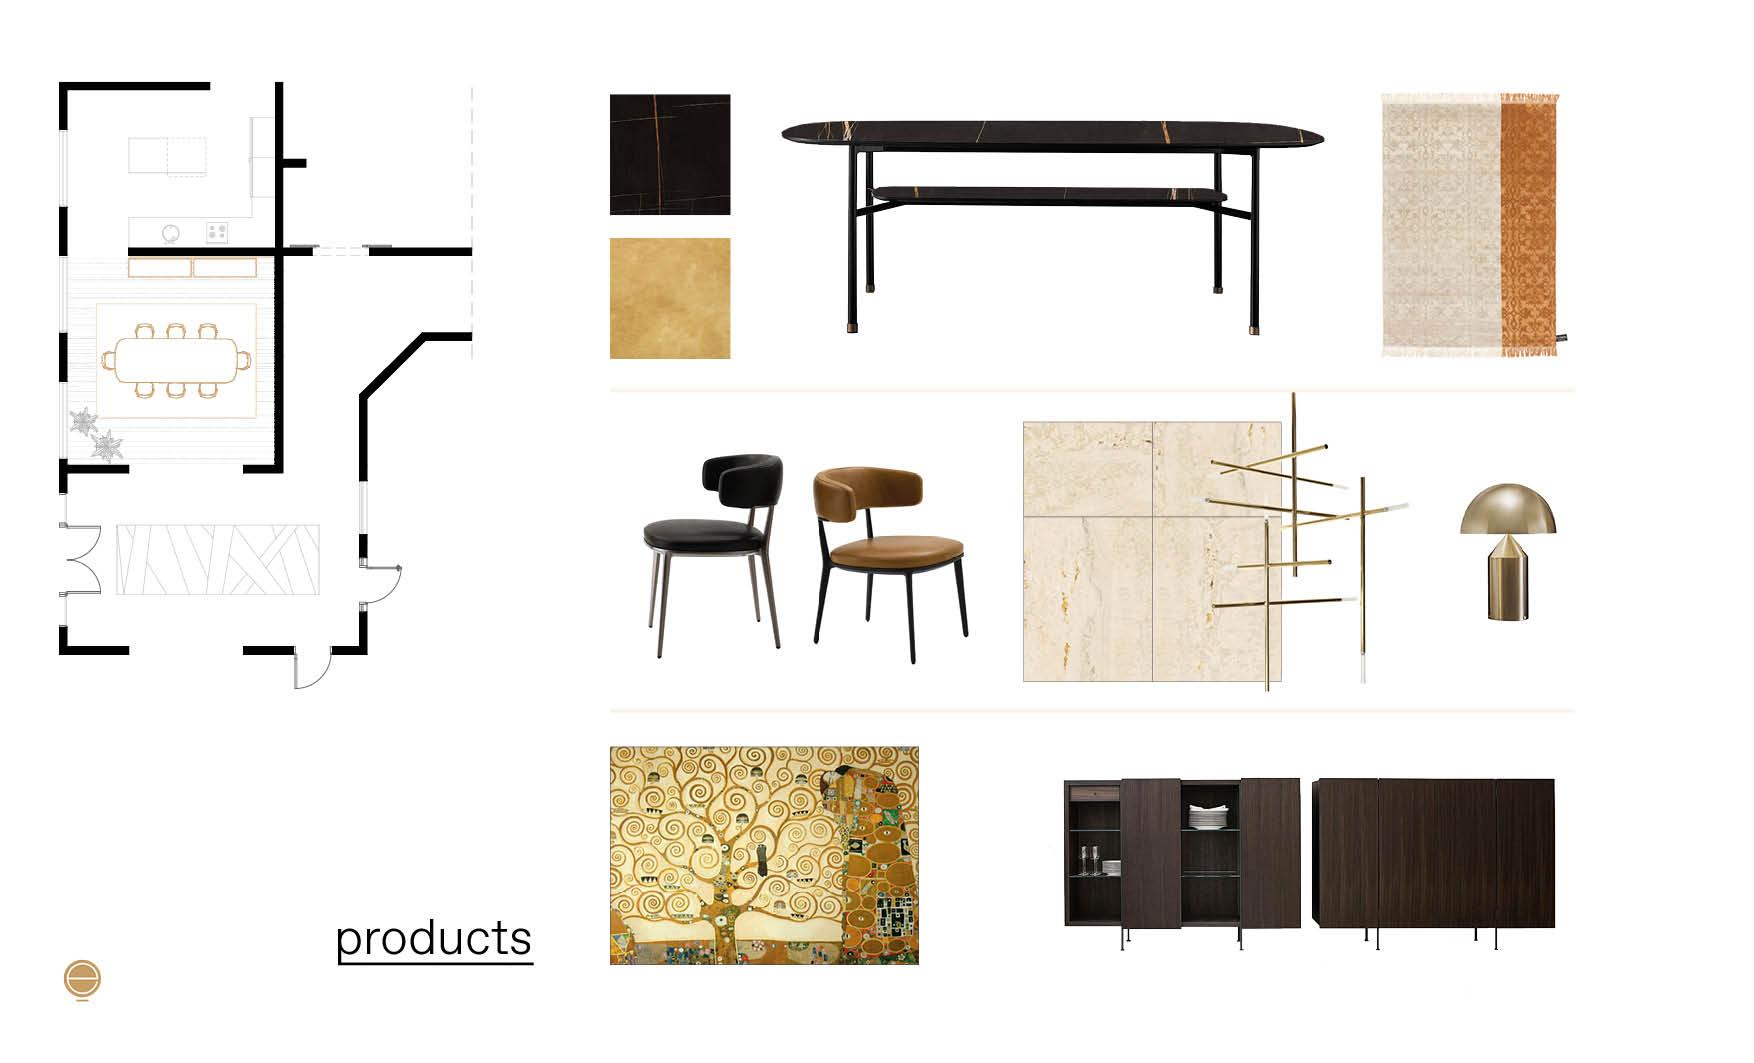 products moodboard of modern Italian dining room set made by Esperiri